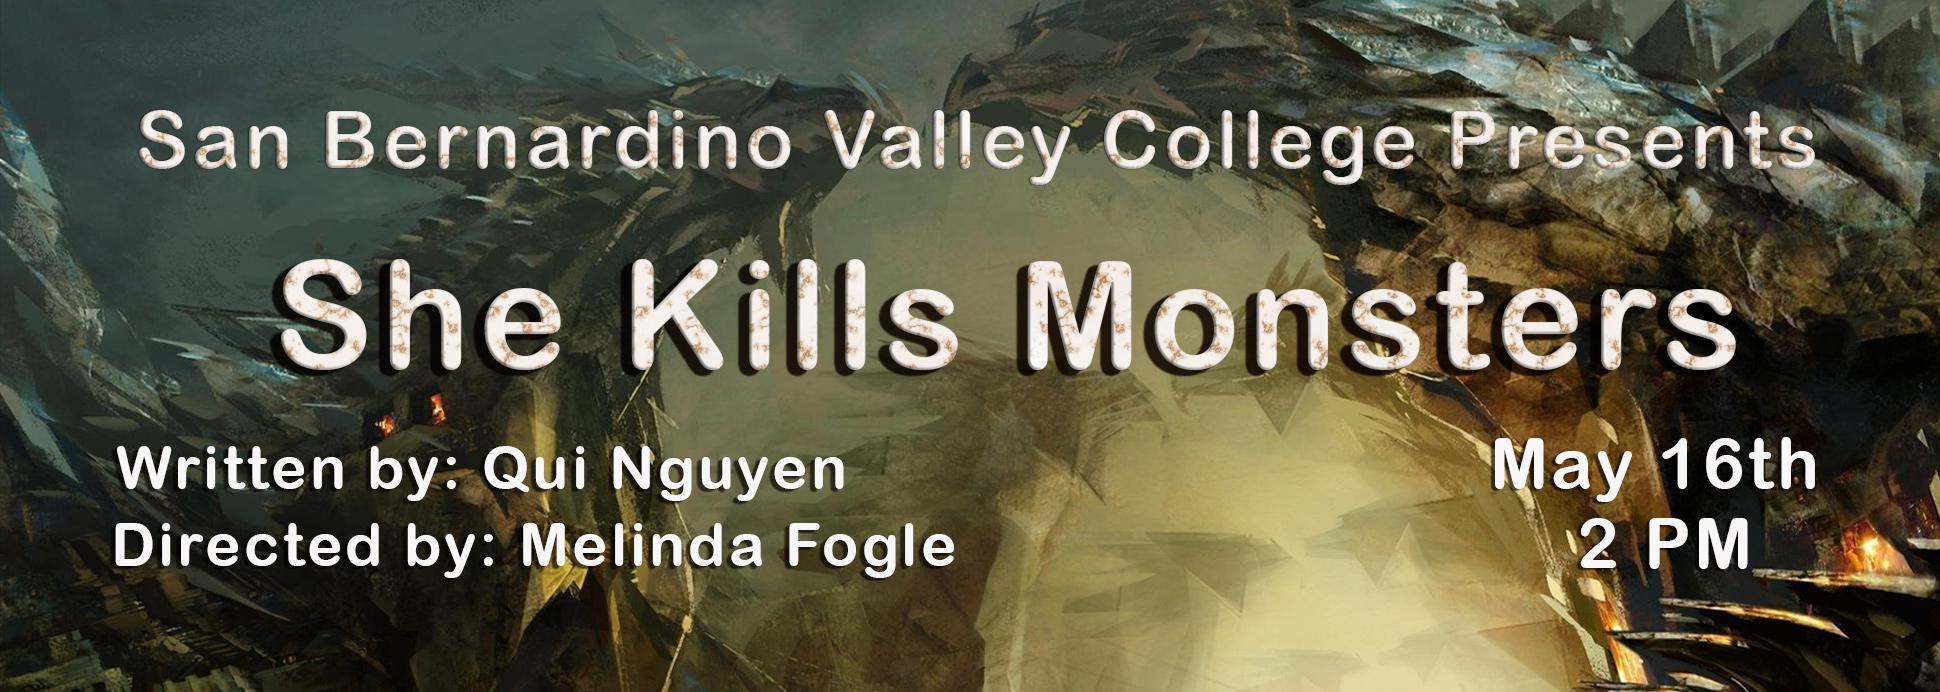 She Kills Monsters May 16th 2:00 PM